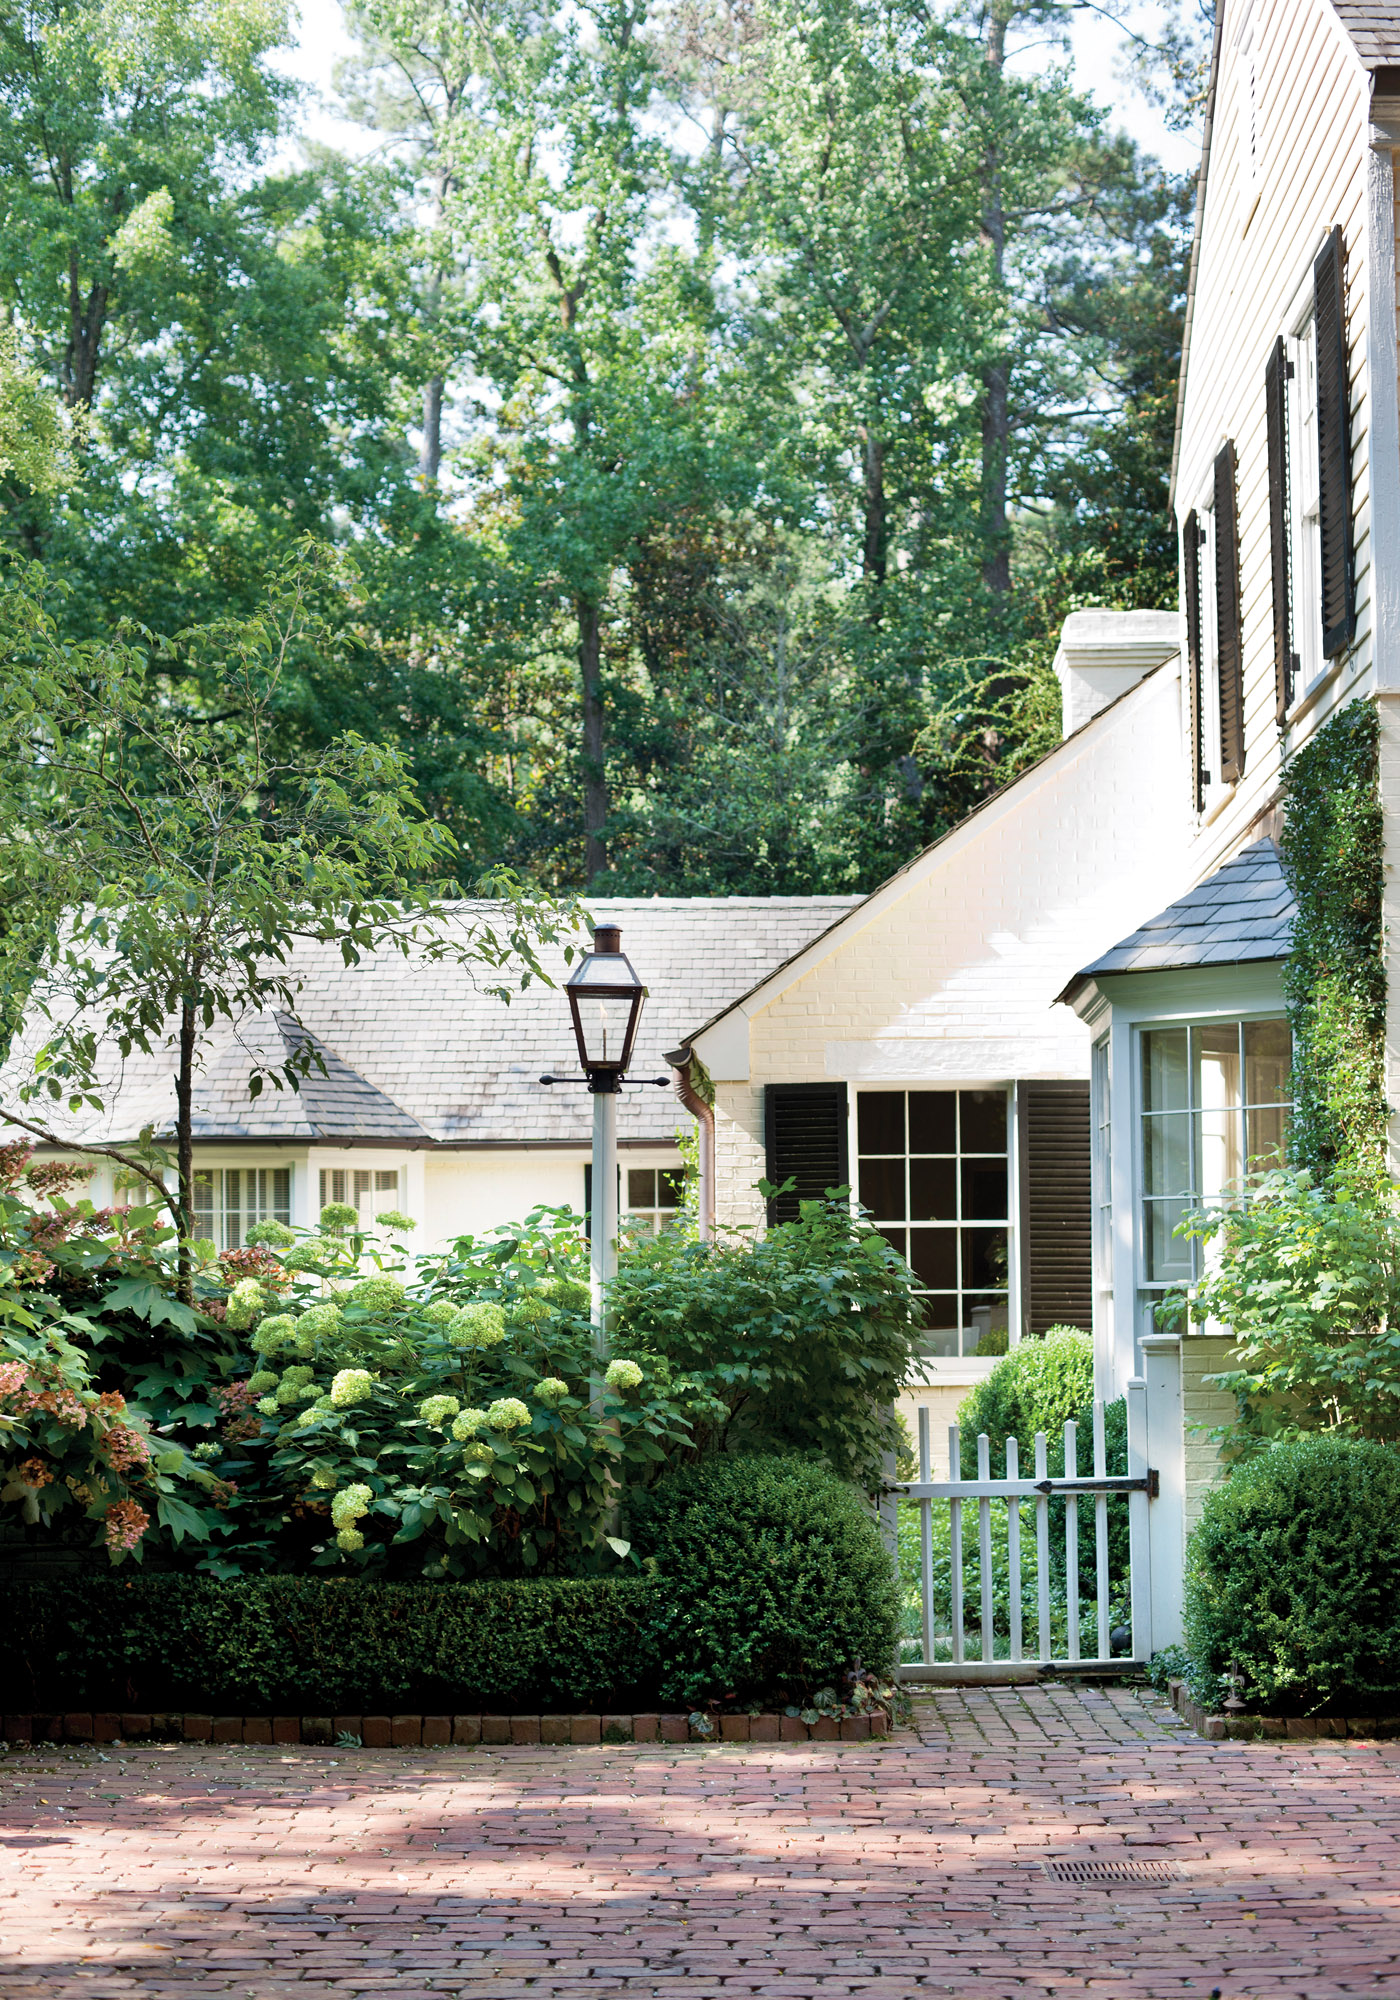 restored Philip Trammell Shutze house